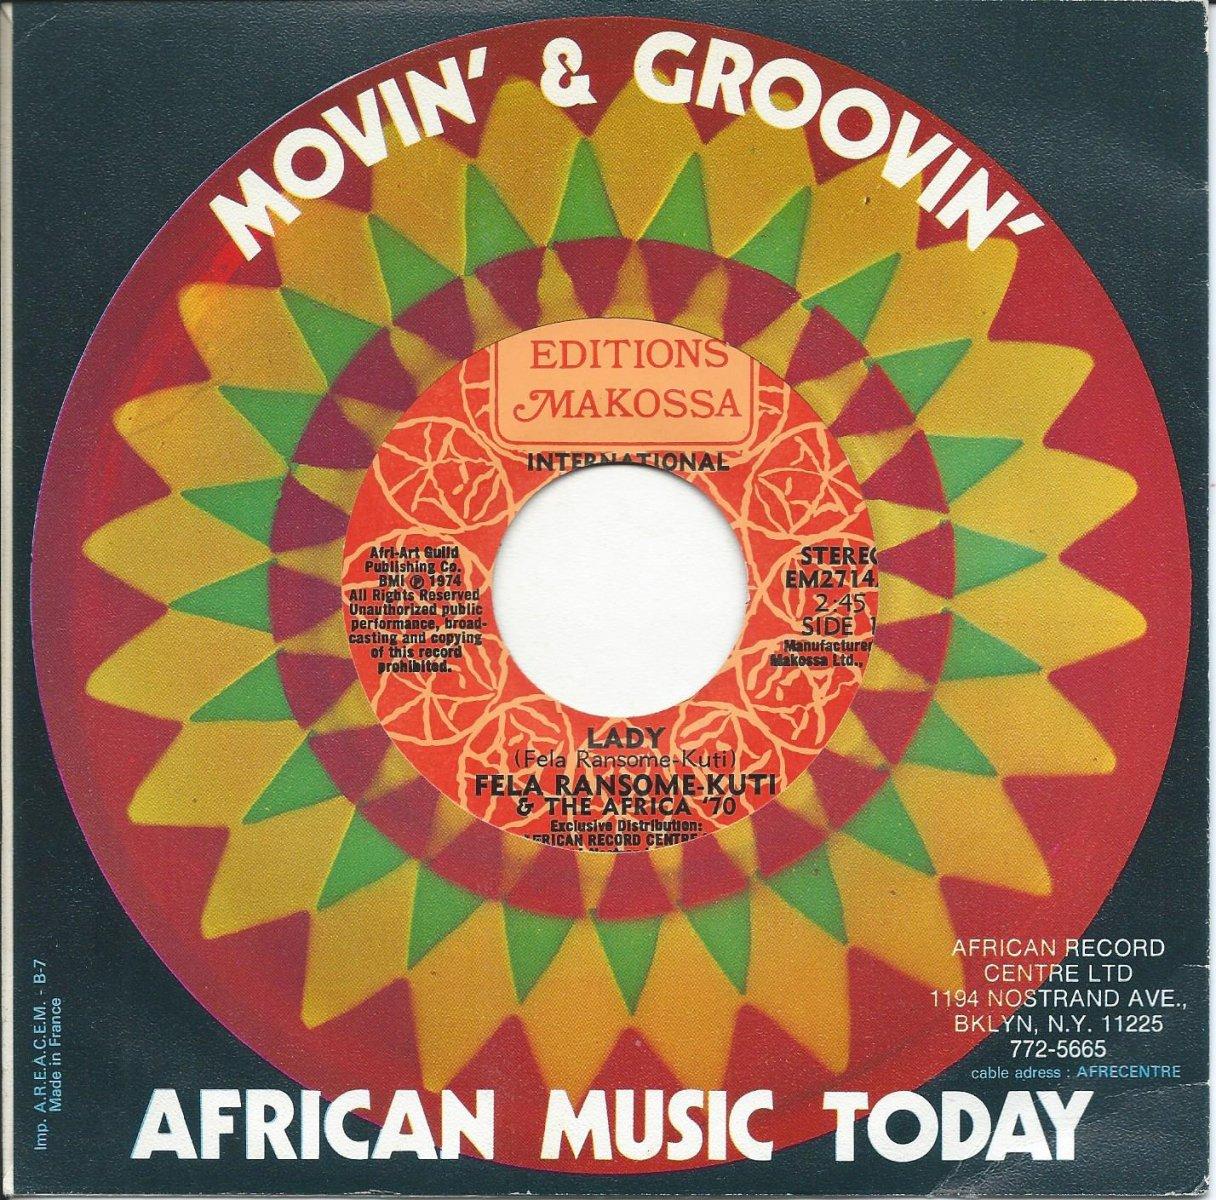 FELA RANSOME-KUTI & THE AFRICA '70 / LADY / SHAKARA OLOJE (7